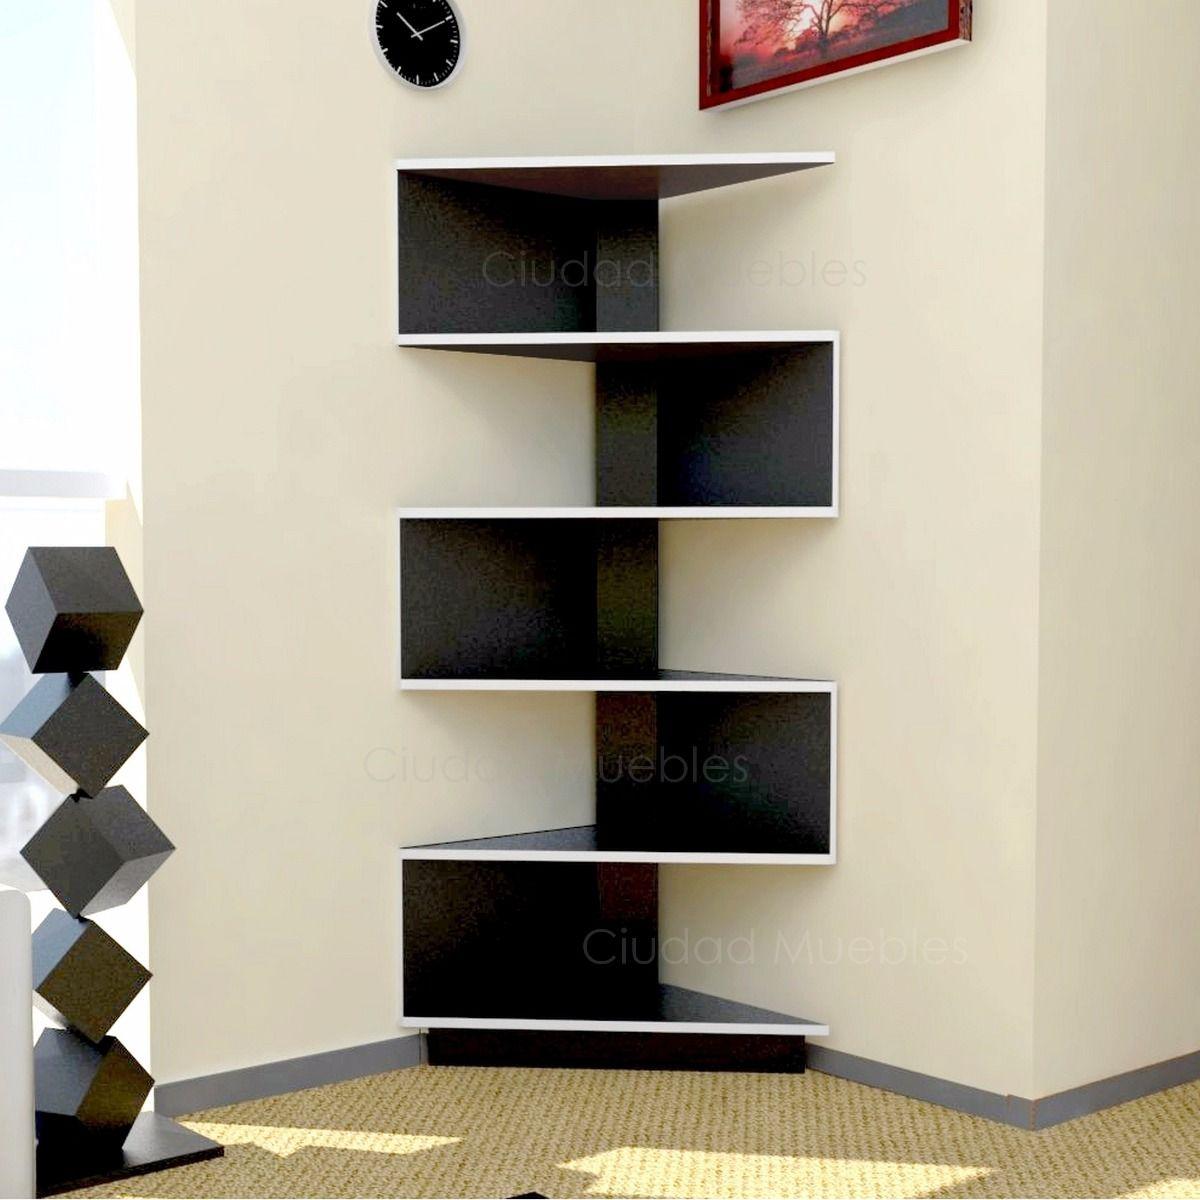 Modular mueble esquinero moderno dise o minimalista unico for Diseno de muebles de madera